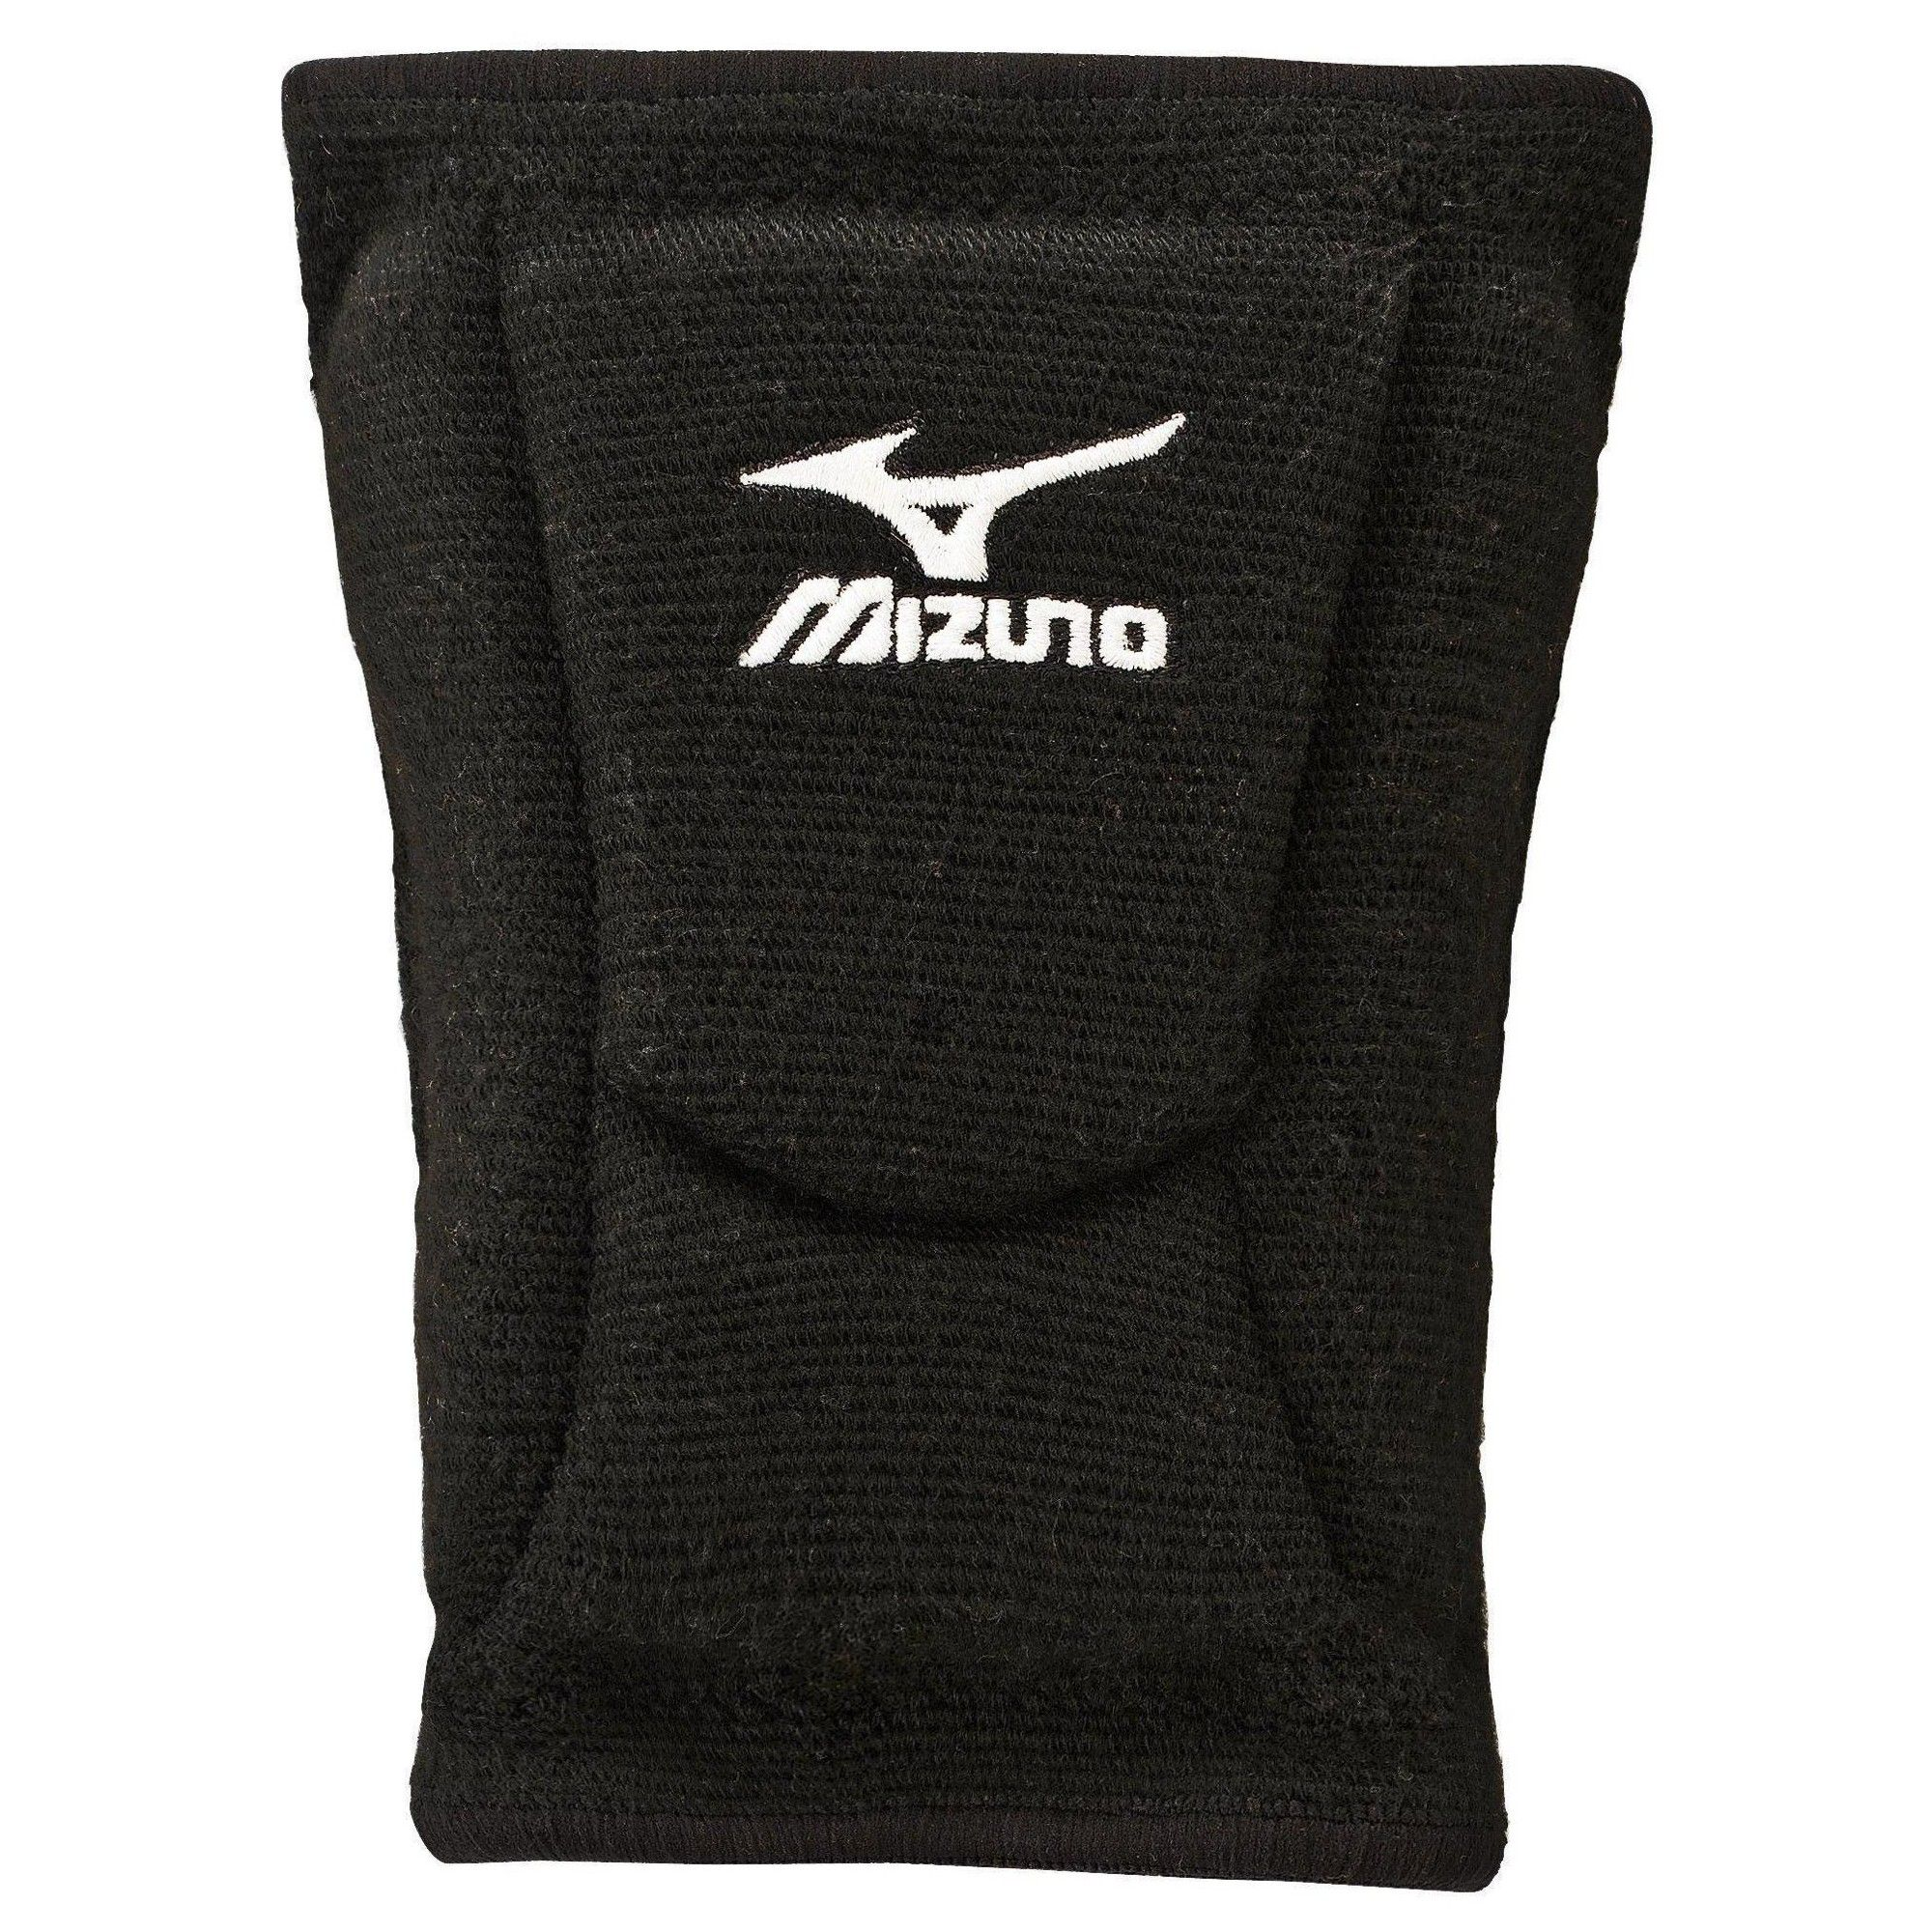 Mizuno Lr6 Volleyball Knee Pads Unisex Size Small In Color Black 9090 Volleyball Knee Pads Mizuno Volleyball Knee Pads